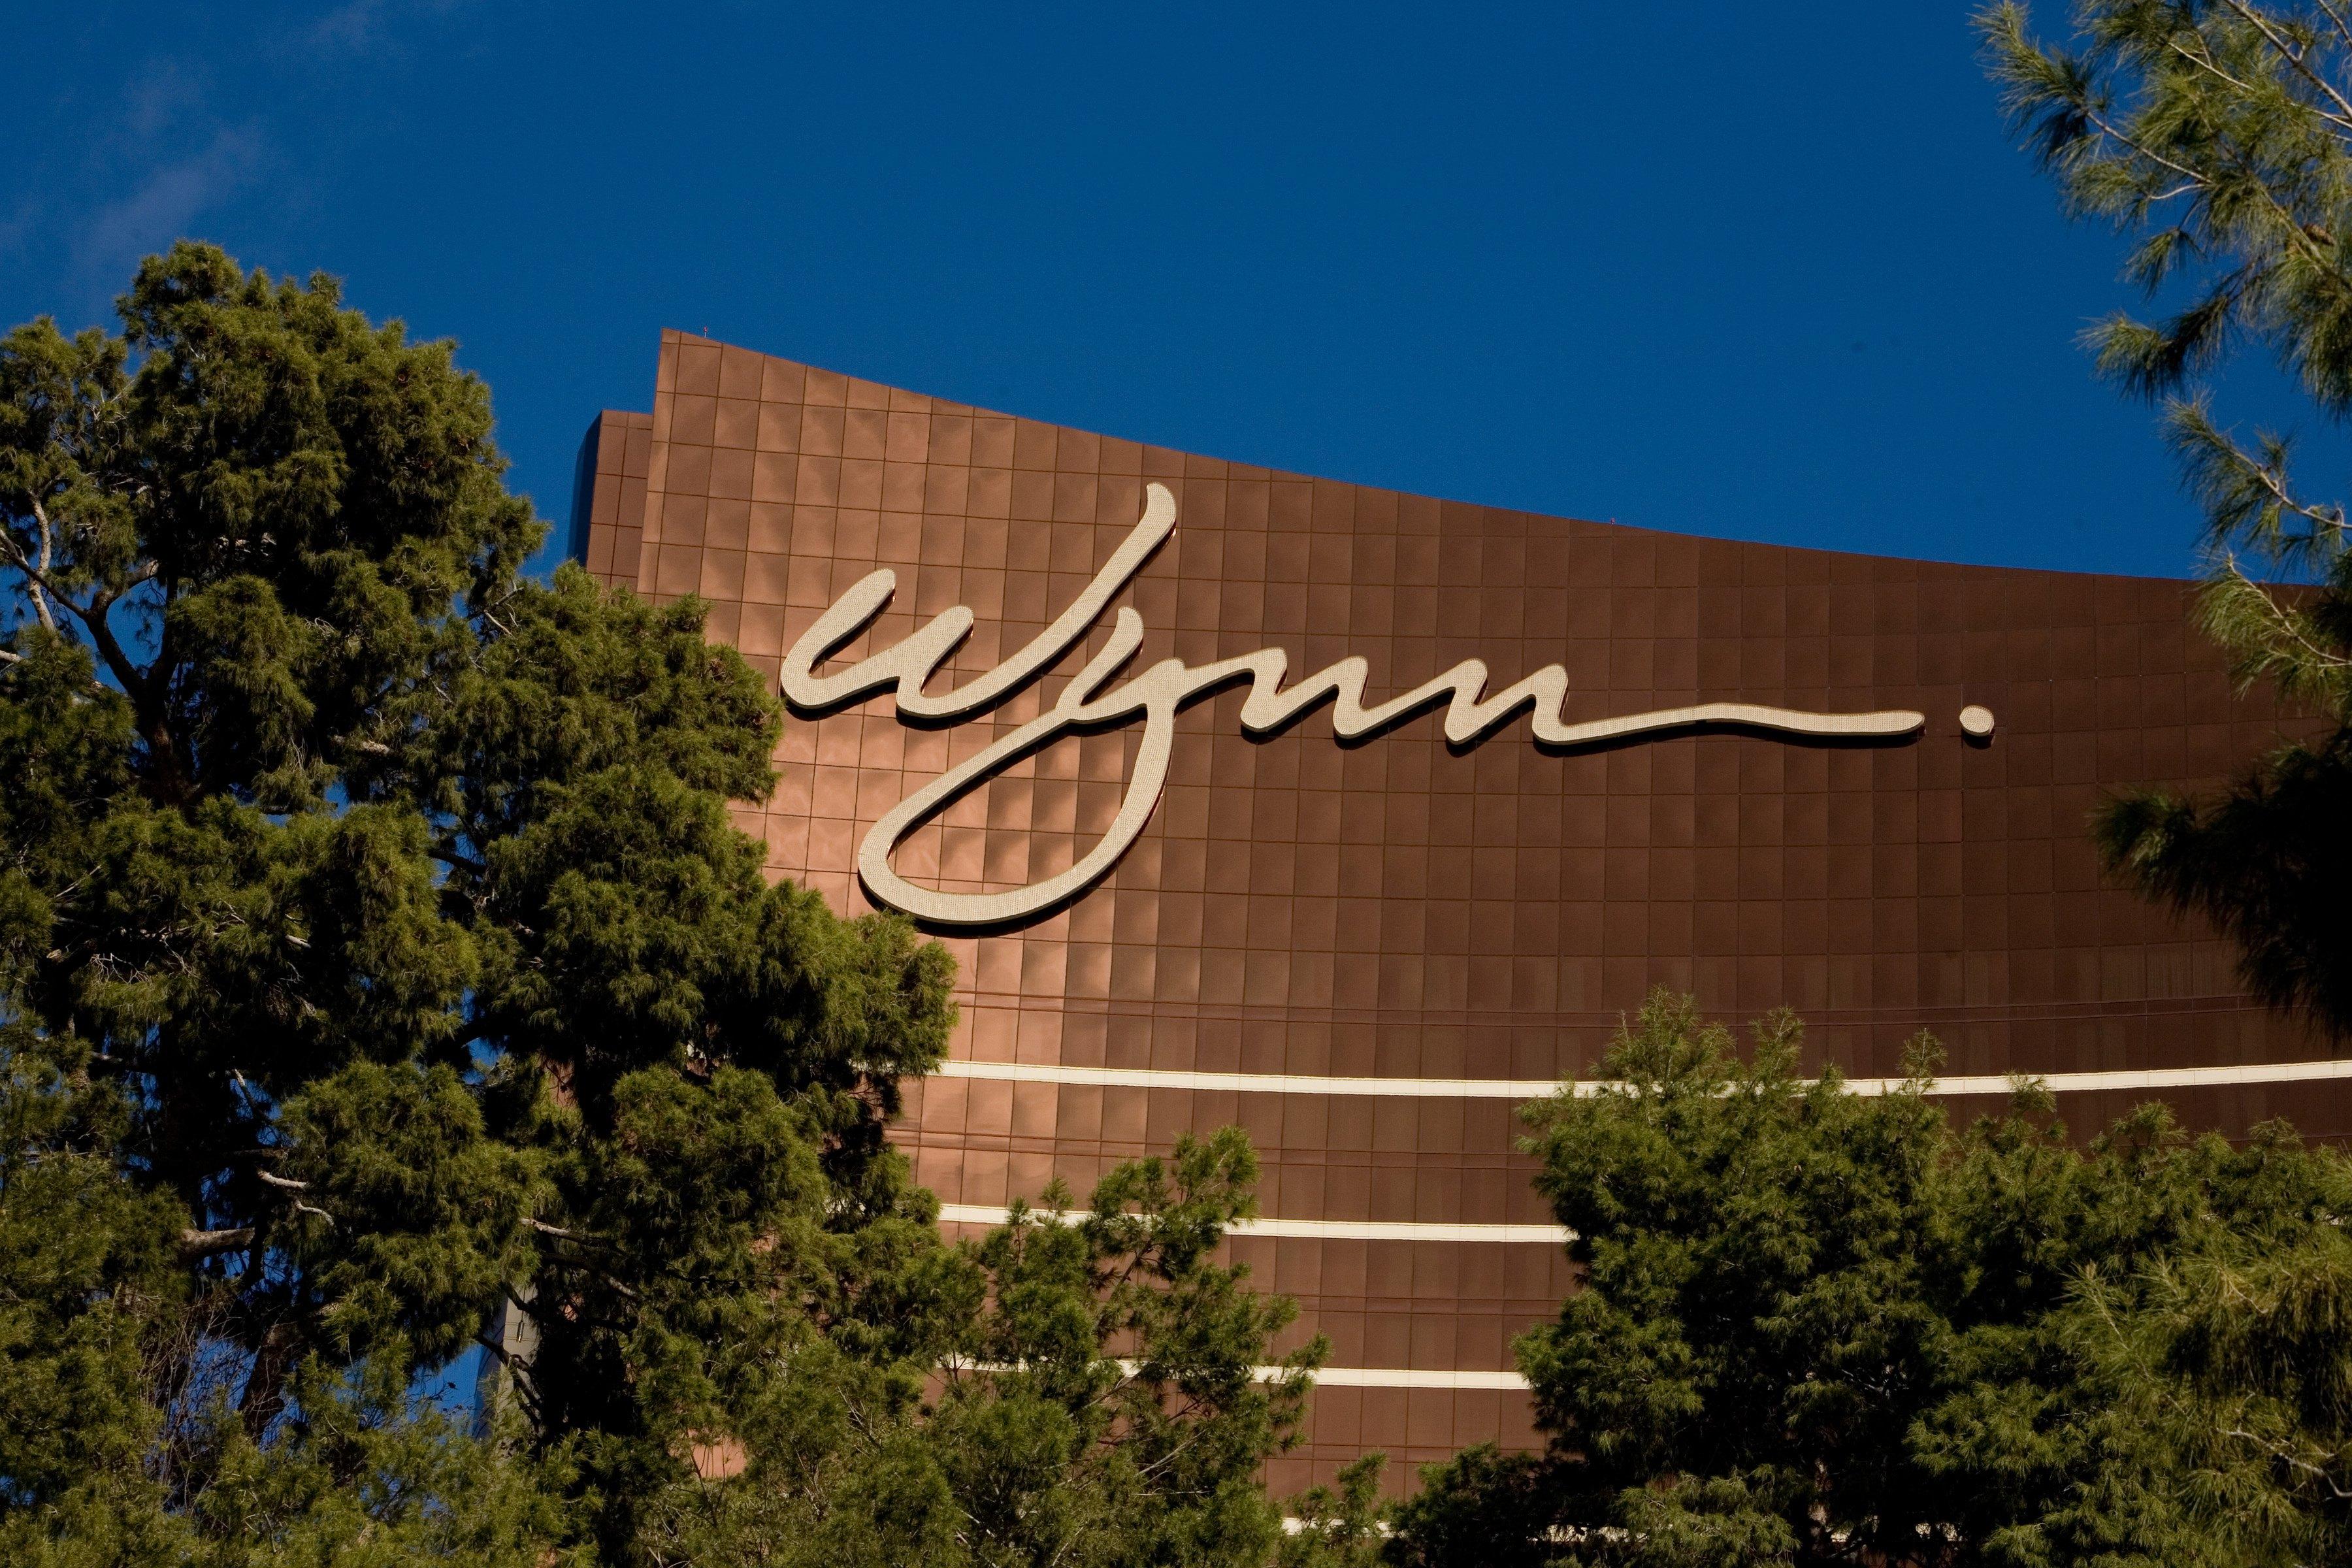 Las Vegas Hit By Economic Downturn